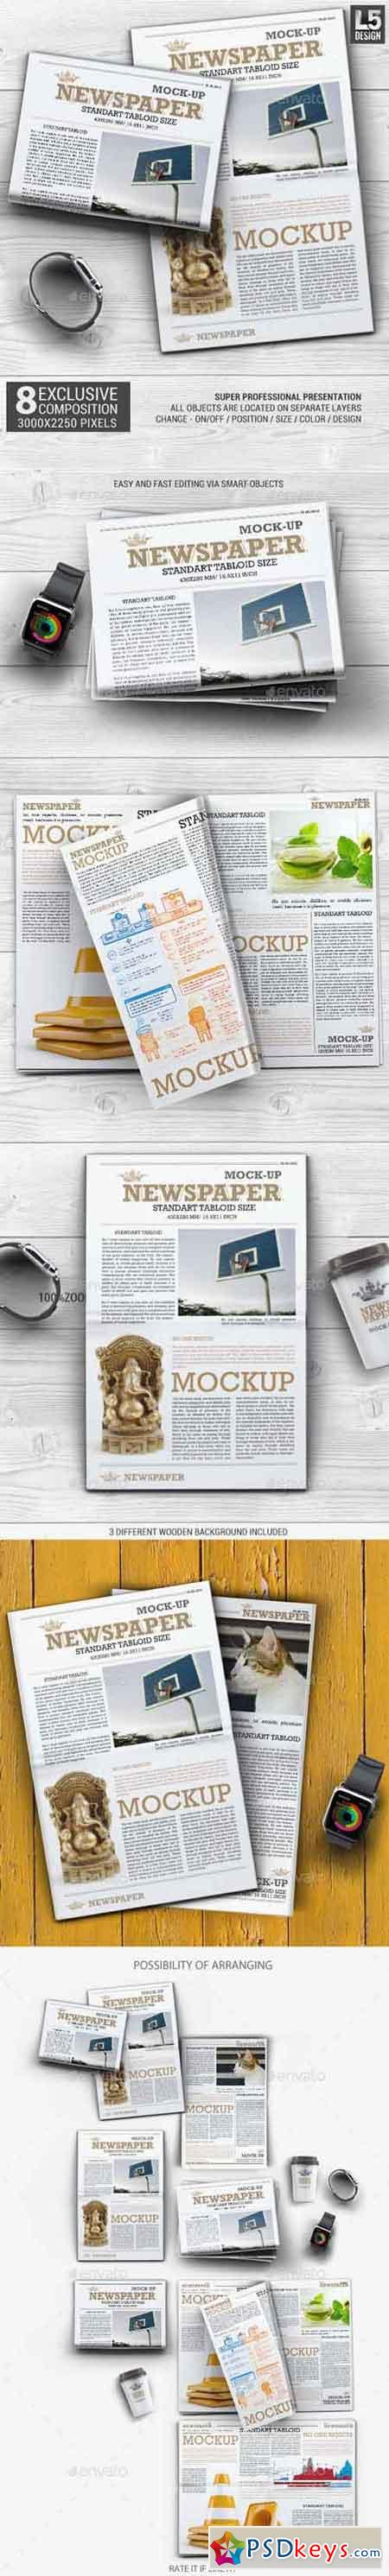 Newspaper Mock-up 13112708